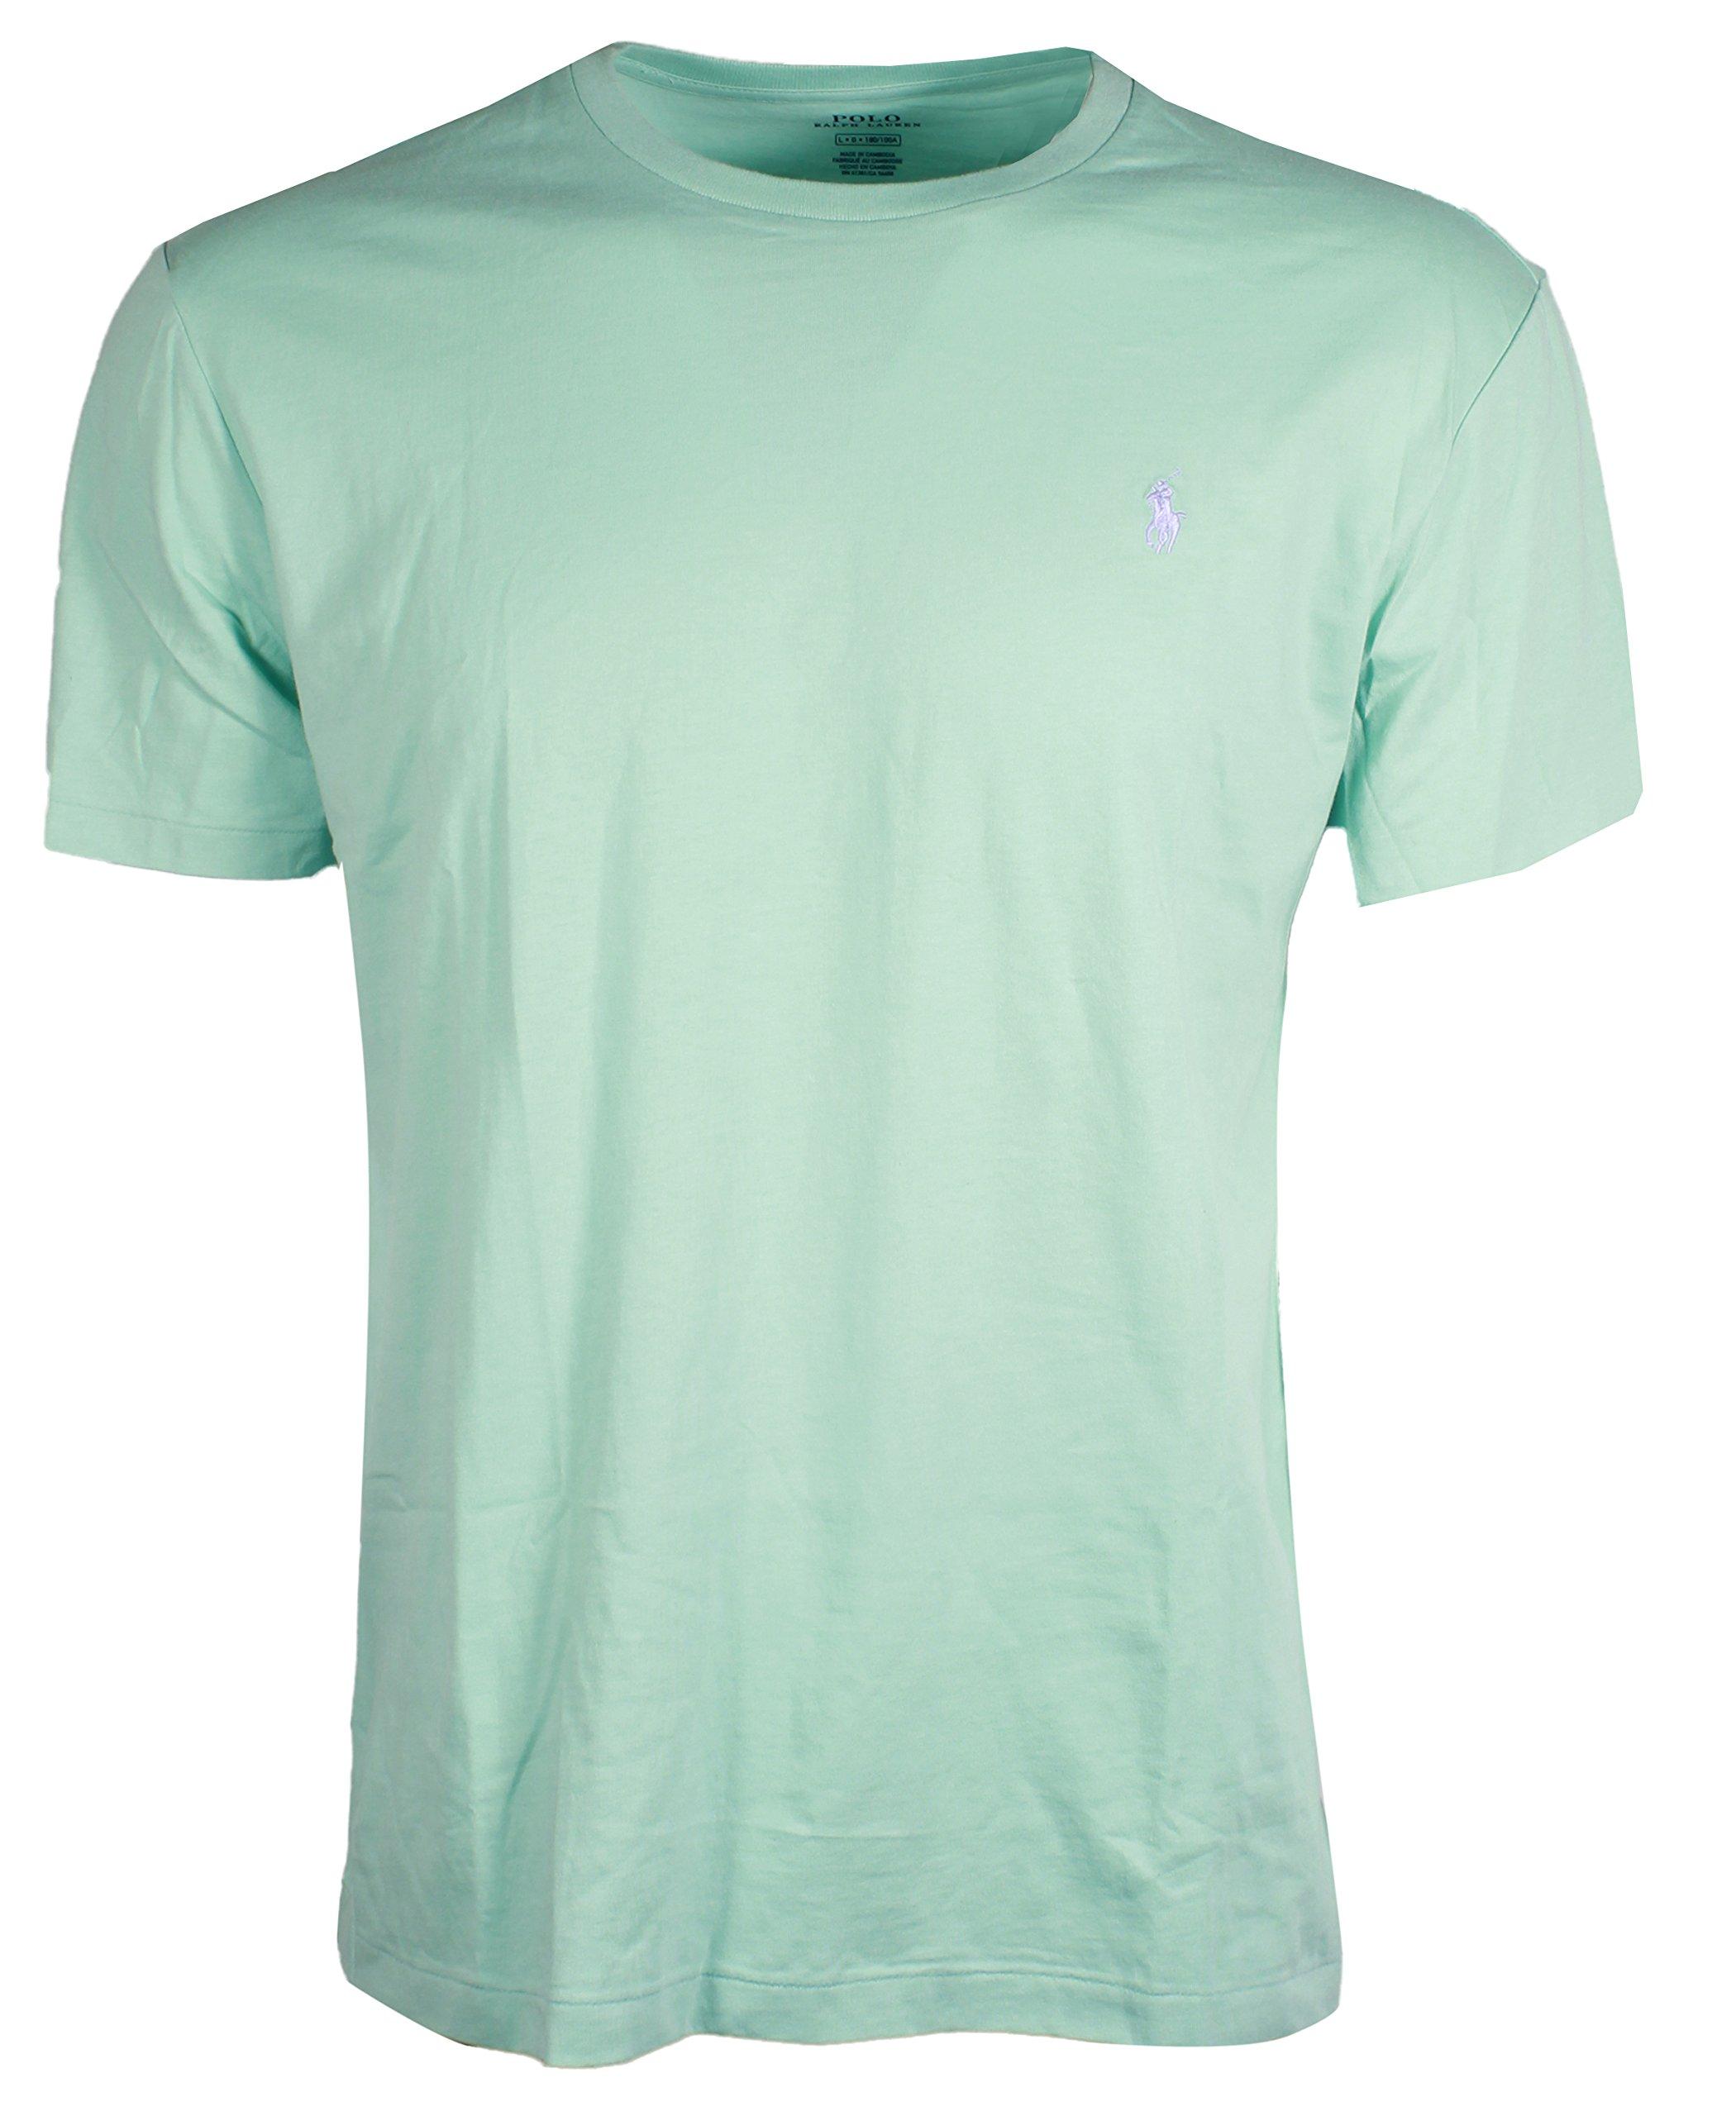 73f5b3cf65b Galleon - Polo Ralph Lauren Men's Classic Fit Crew-Neck T-Shirt Cotton  (XX-Large, Green (Light Purple Pony))